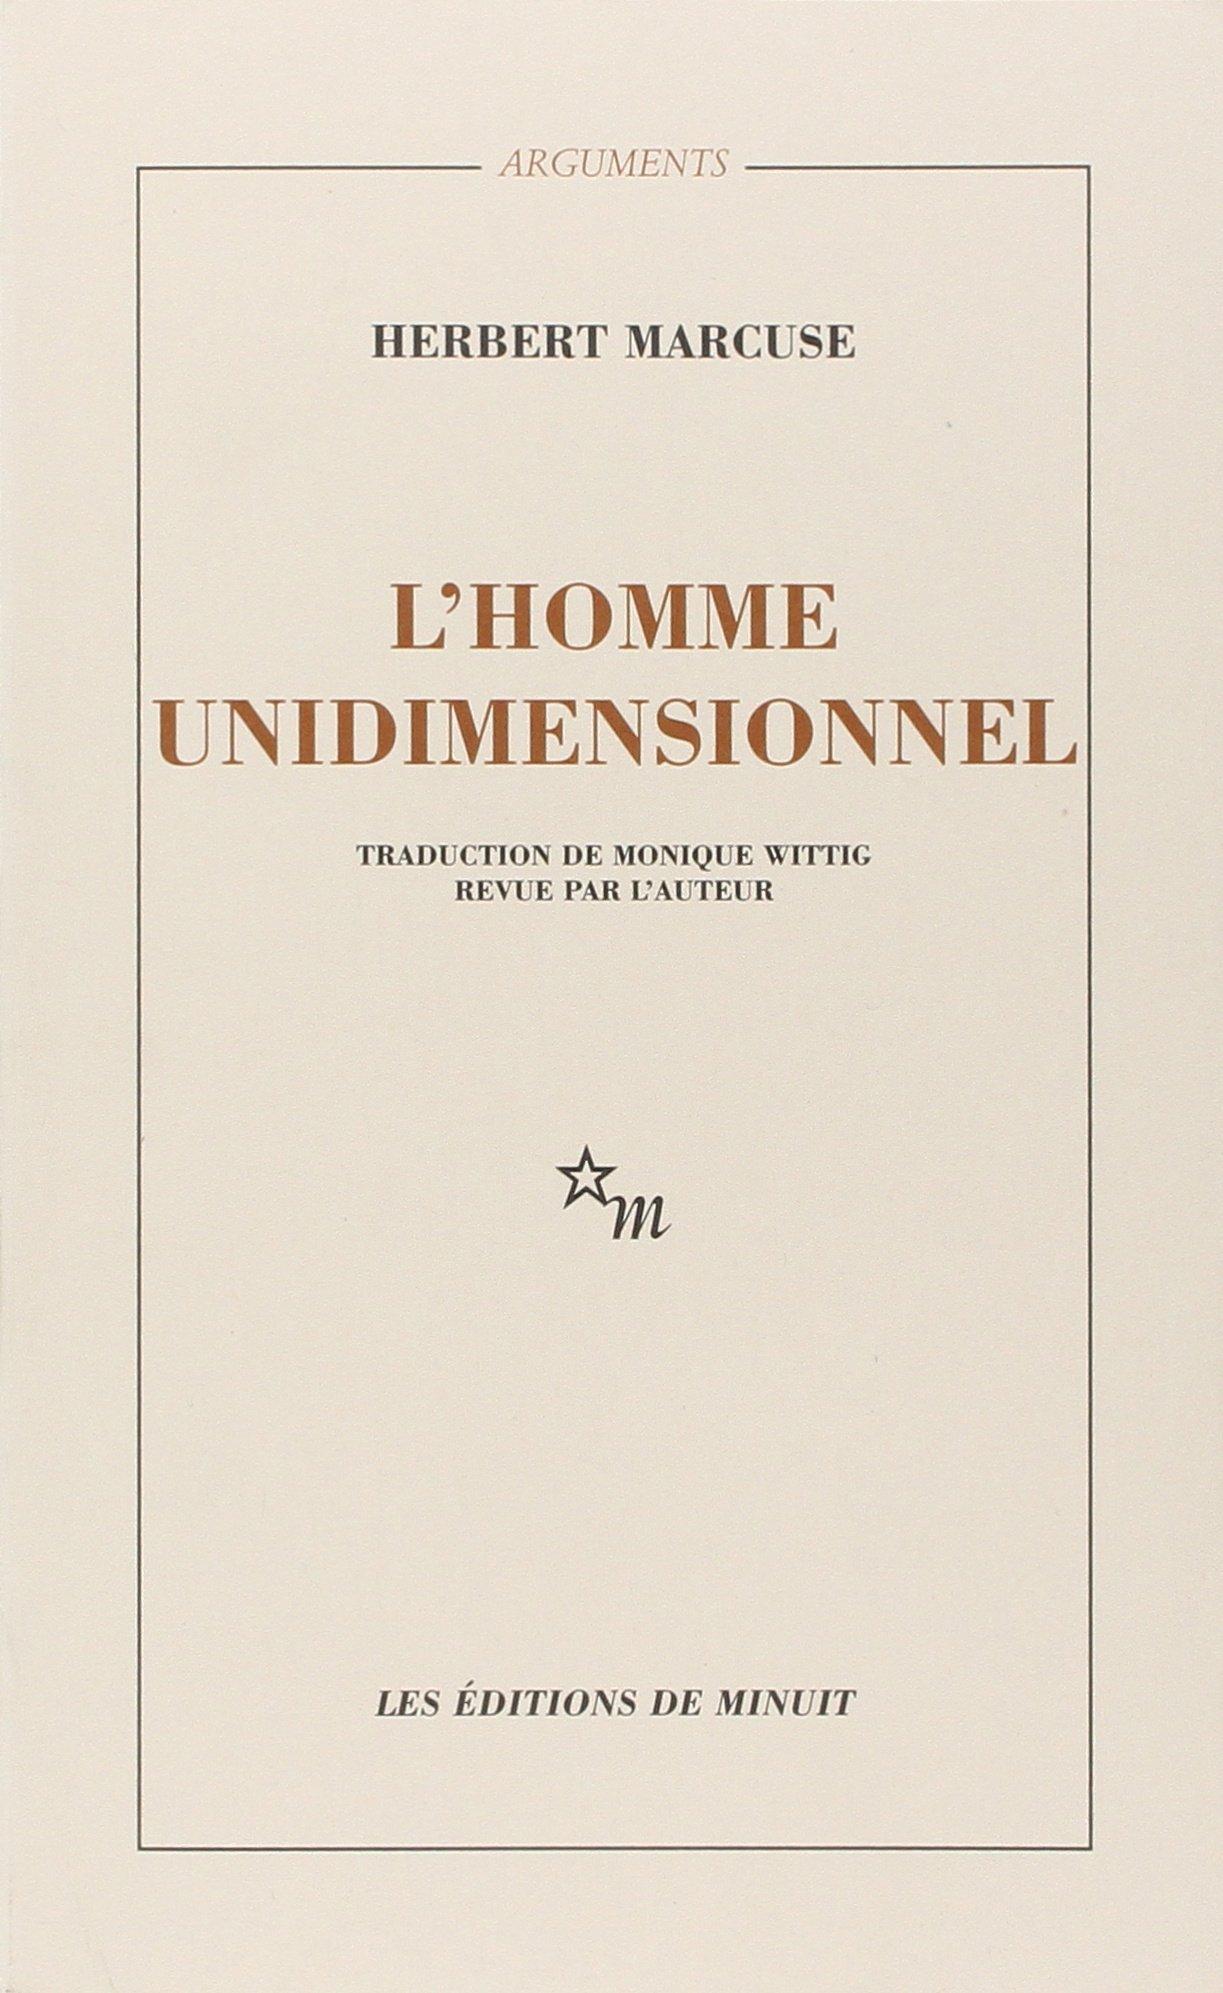 L'HOMME UNIDIMENSIONNEL Broché – 1 avril 1968 Herbert Marcuse L' HOMME UNIDIMENSIONNEL Editions de Minuit 2707303739